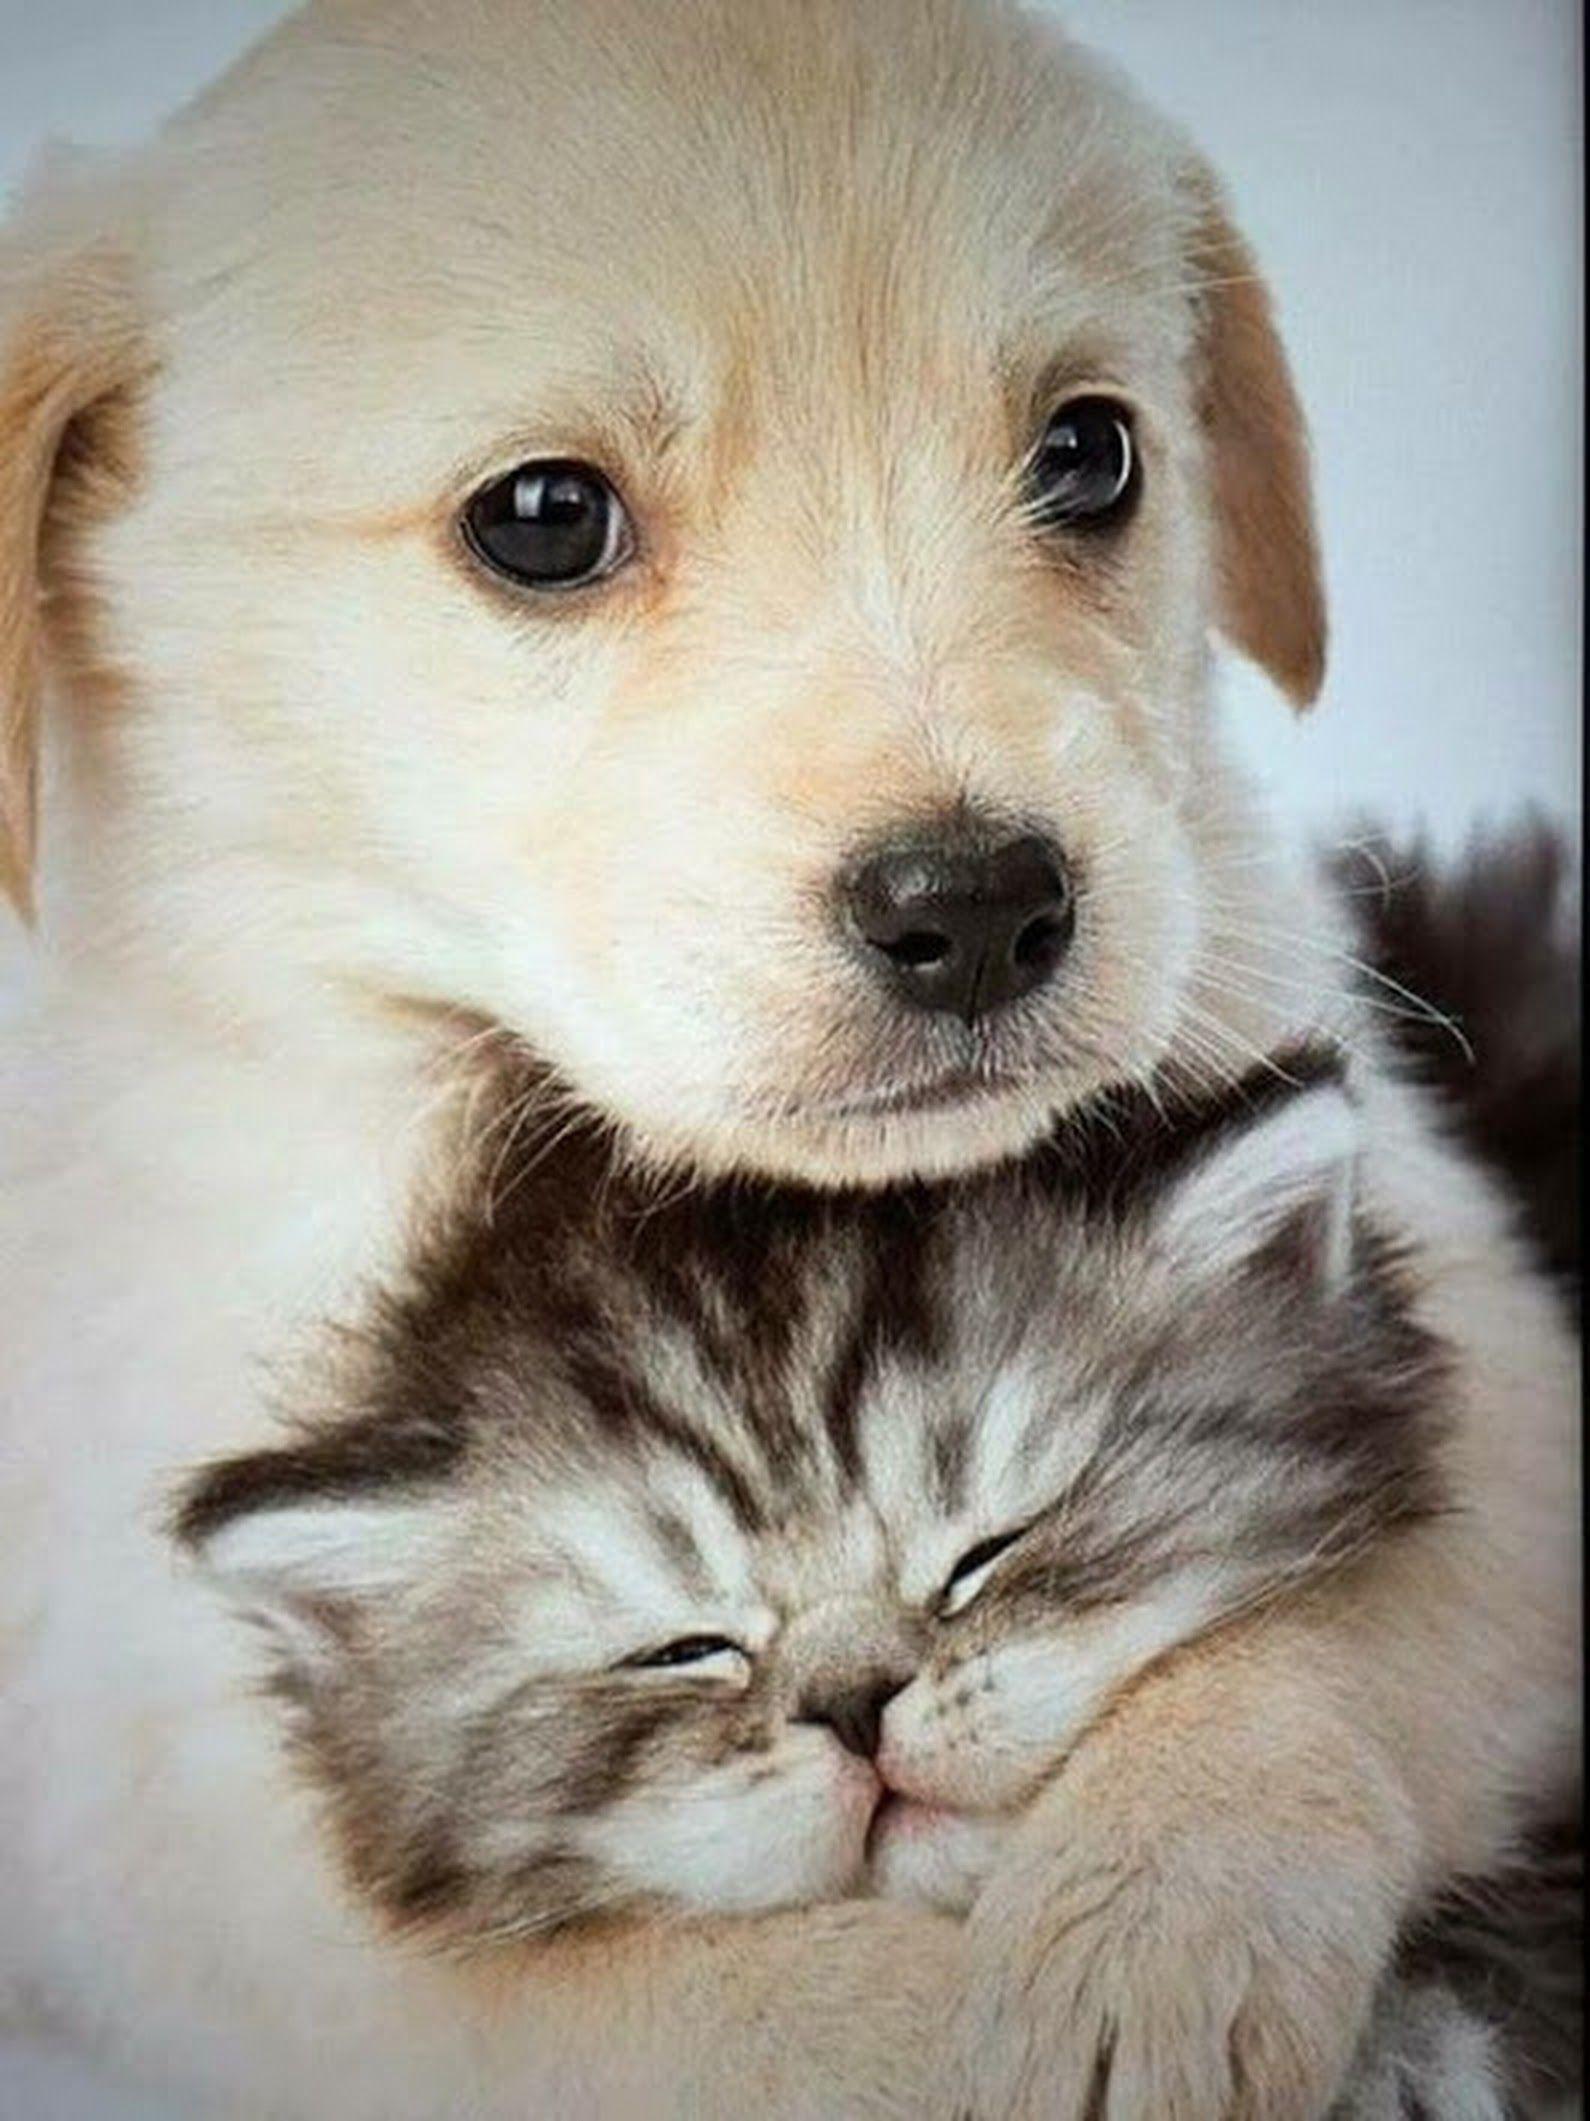 Imagens Fofos De Animais Google Search Gatos Bonitos Perro Y Gato Juntos Animales Adorables